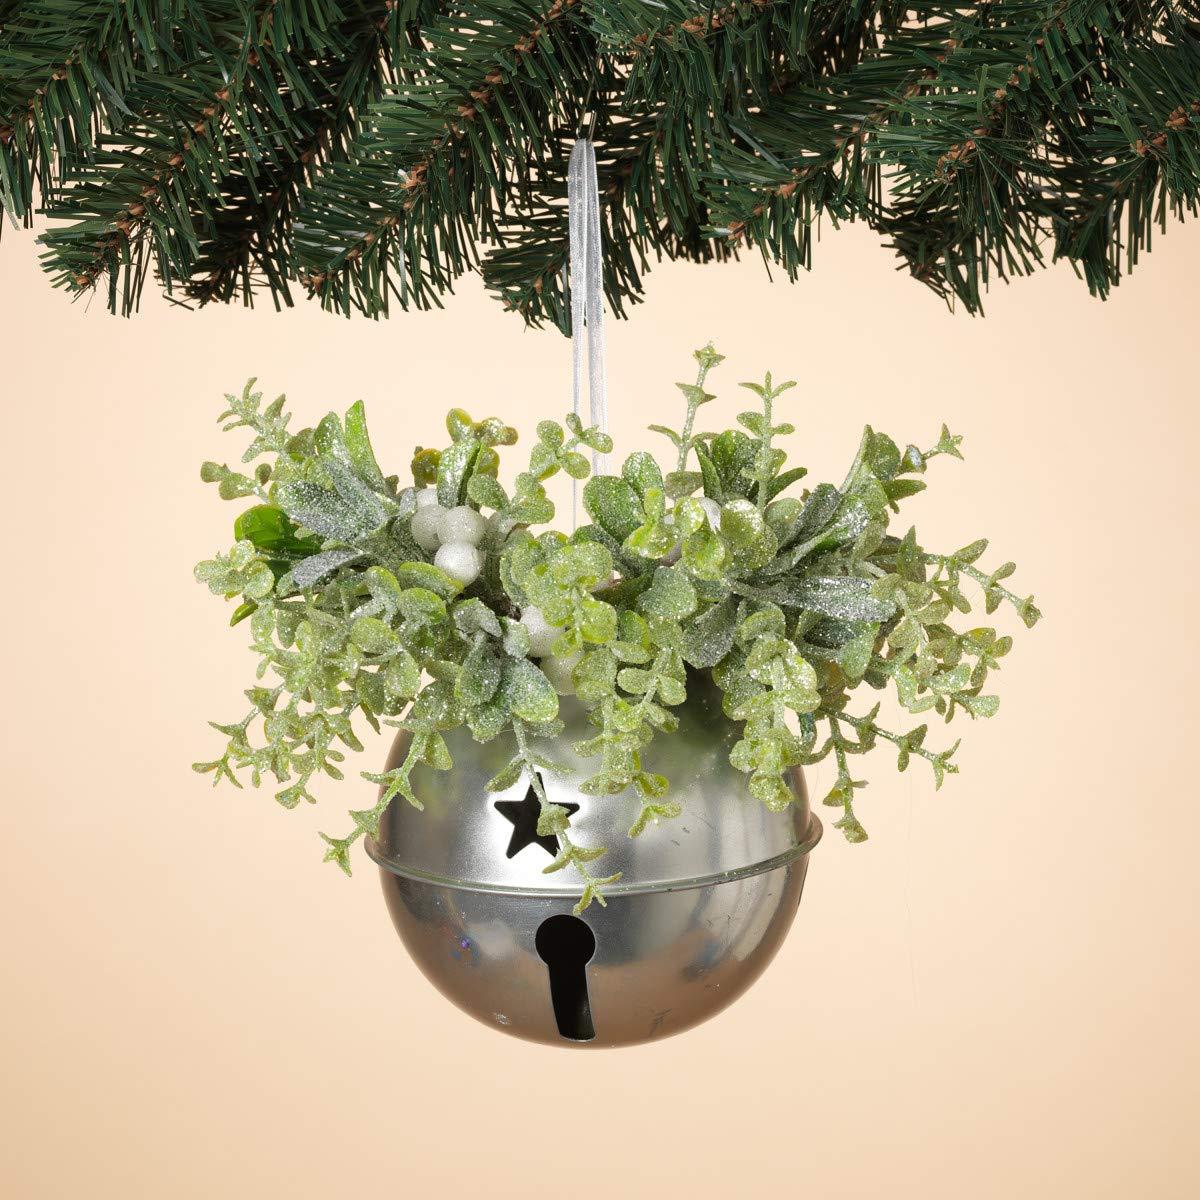 GIL 8'' H Holiday Mistletoe & Metal Christmas, 5InL x 5InW x 8InH, Green